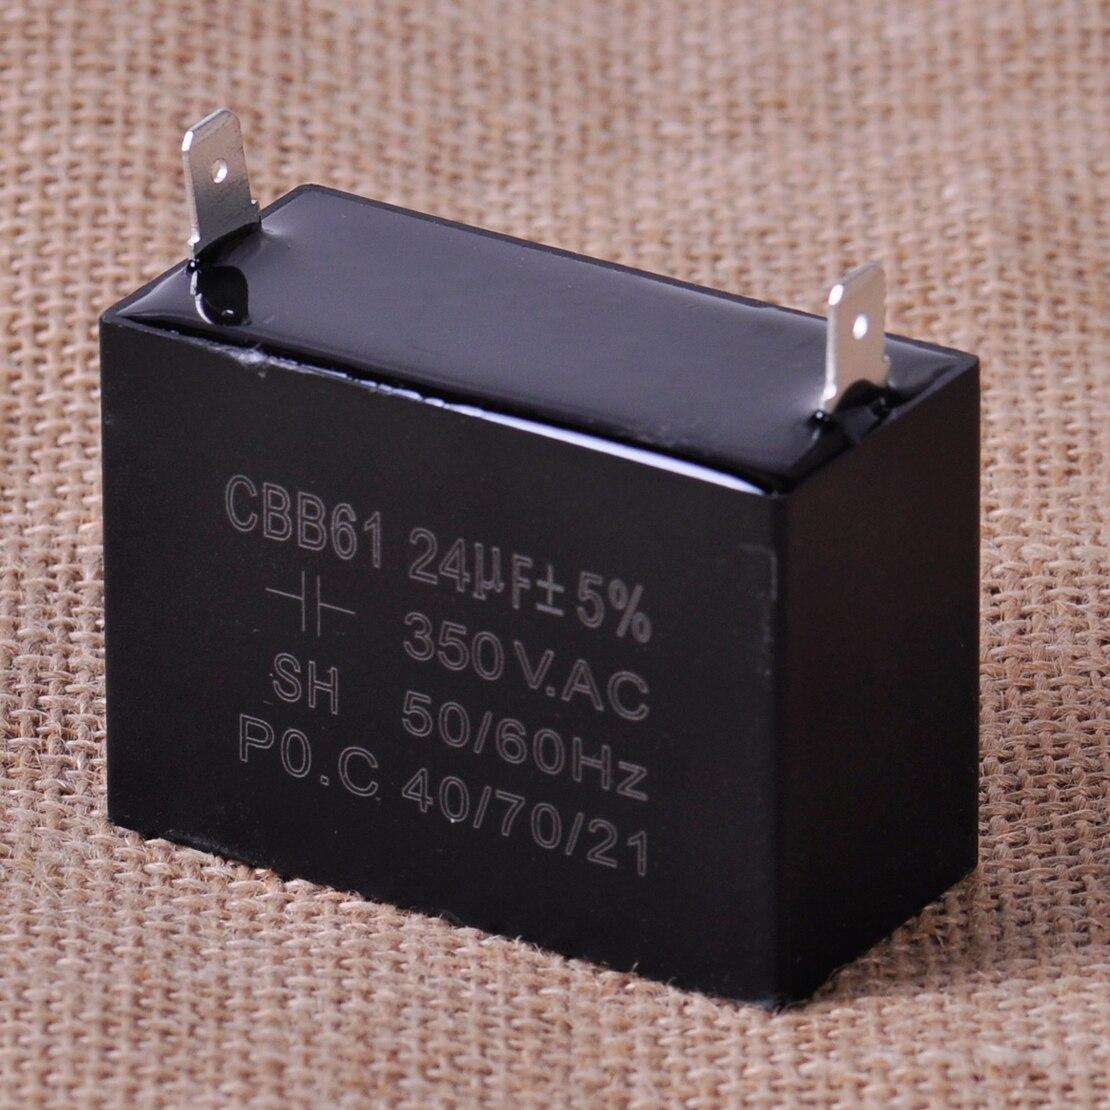 Small Gasoline Generator Capacitor CBB61 12uF Ceiling Fan Motor 350 VAC 50//60HZ